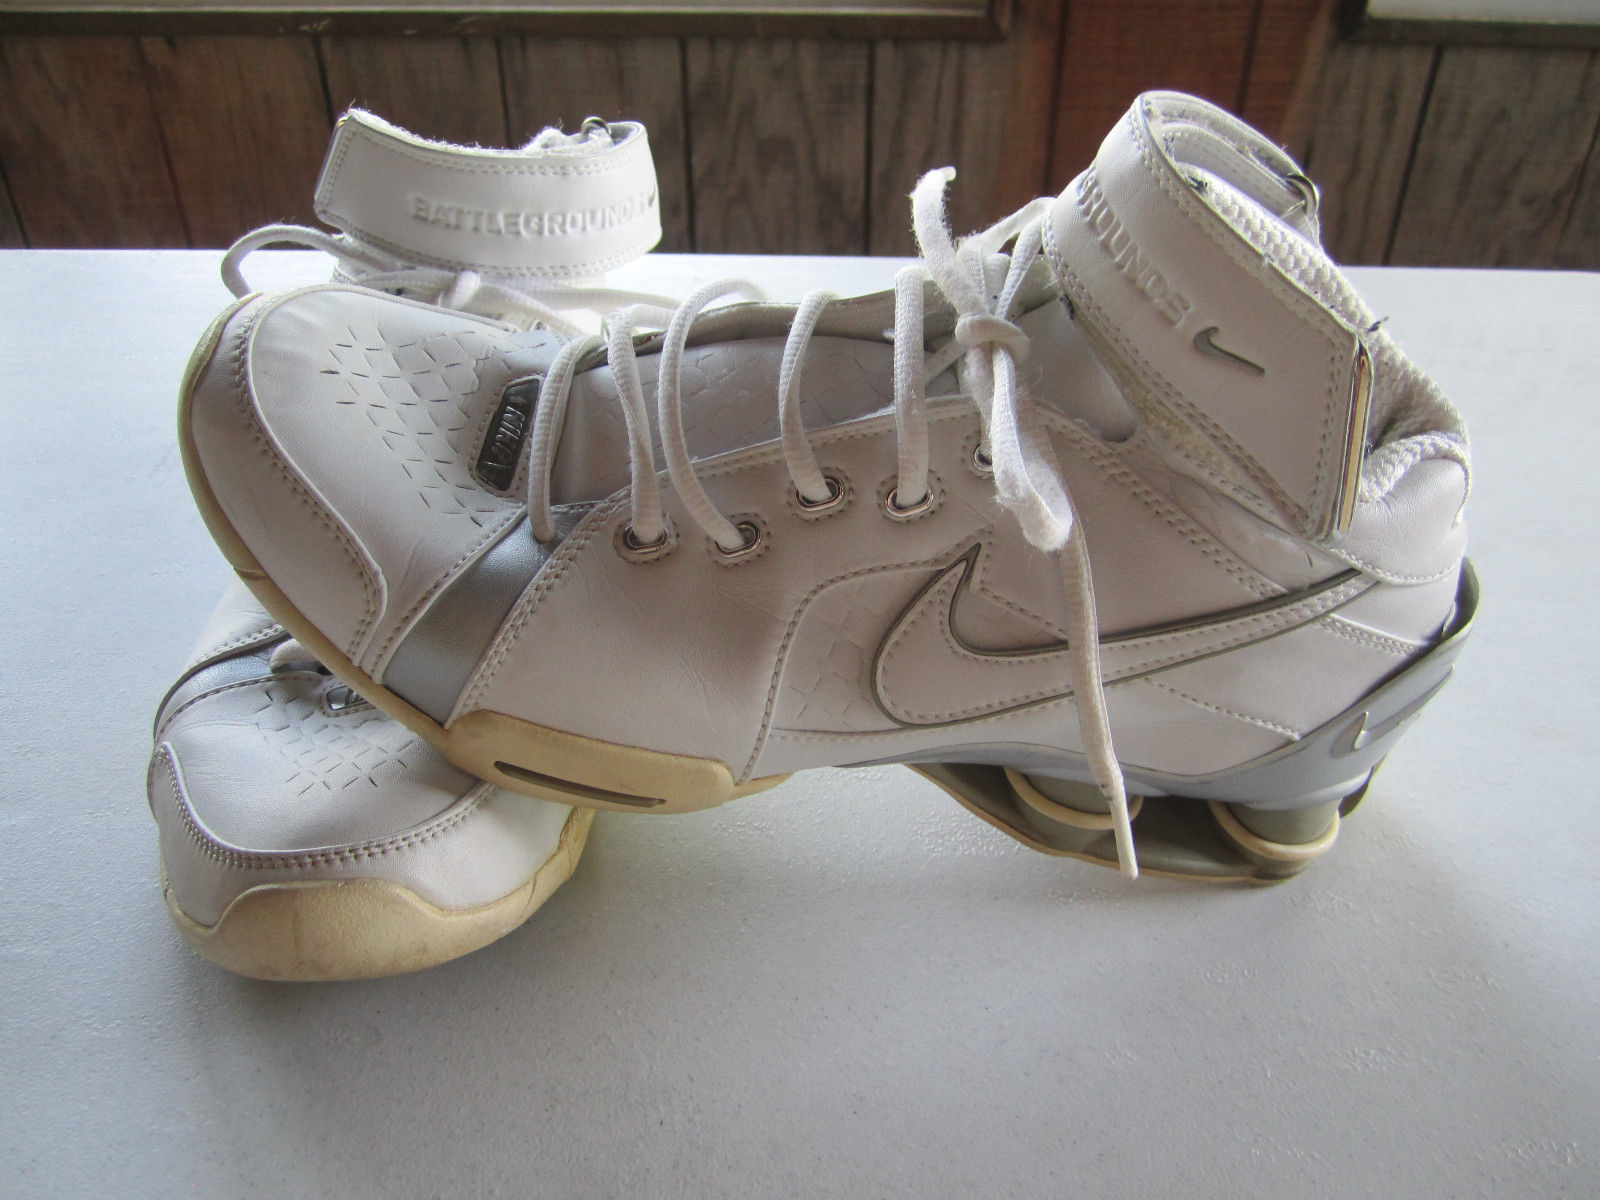 2f3a6faccb86 Nike Shox Battlegrounds Men s Basketball and 50 similar items. 57